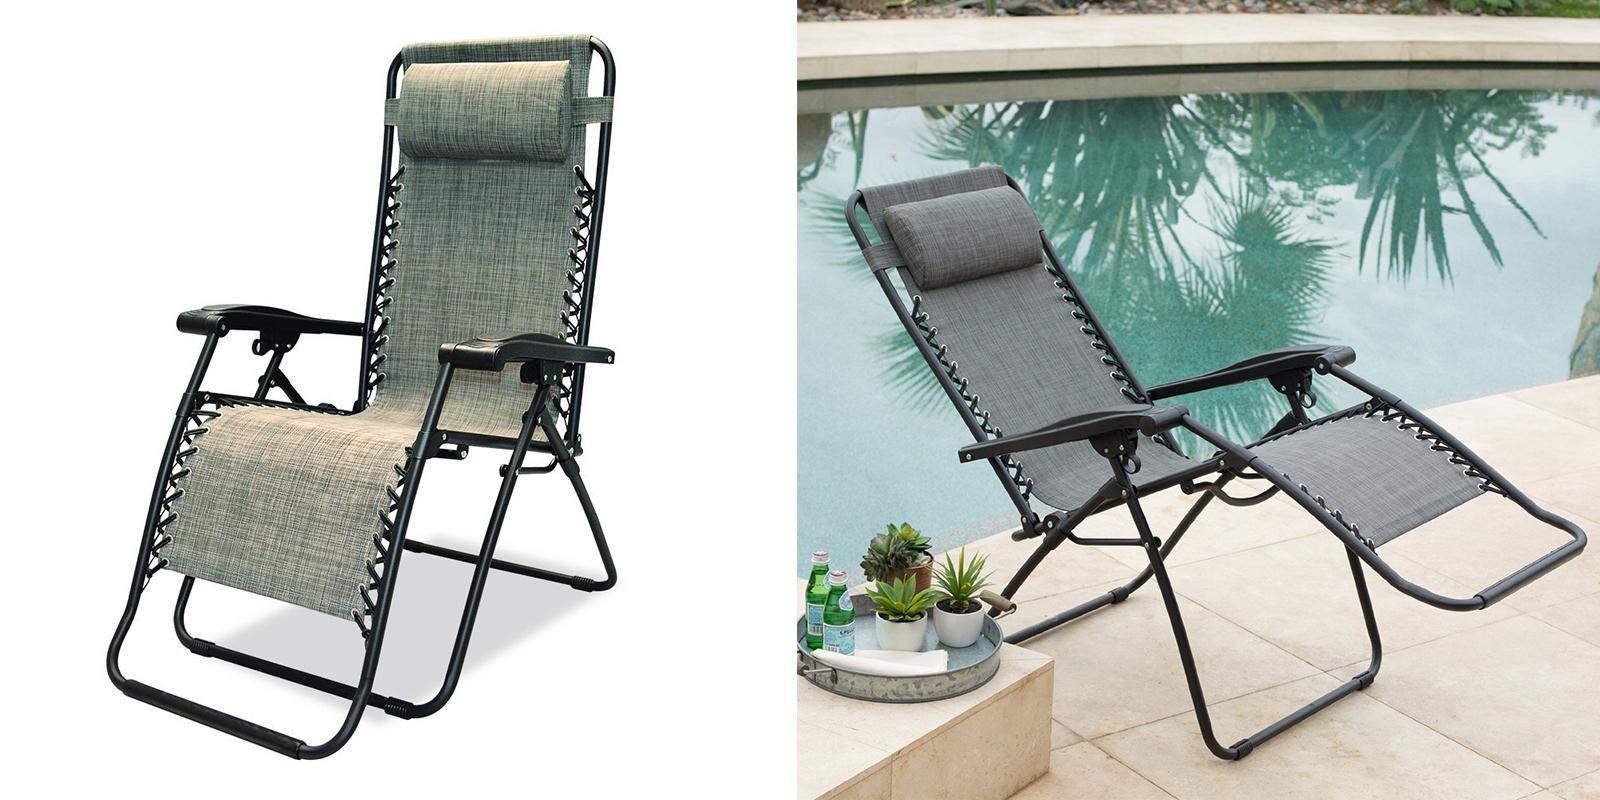 Patio Chair - Zero Gravity Chair